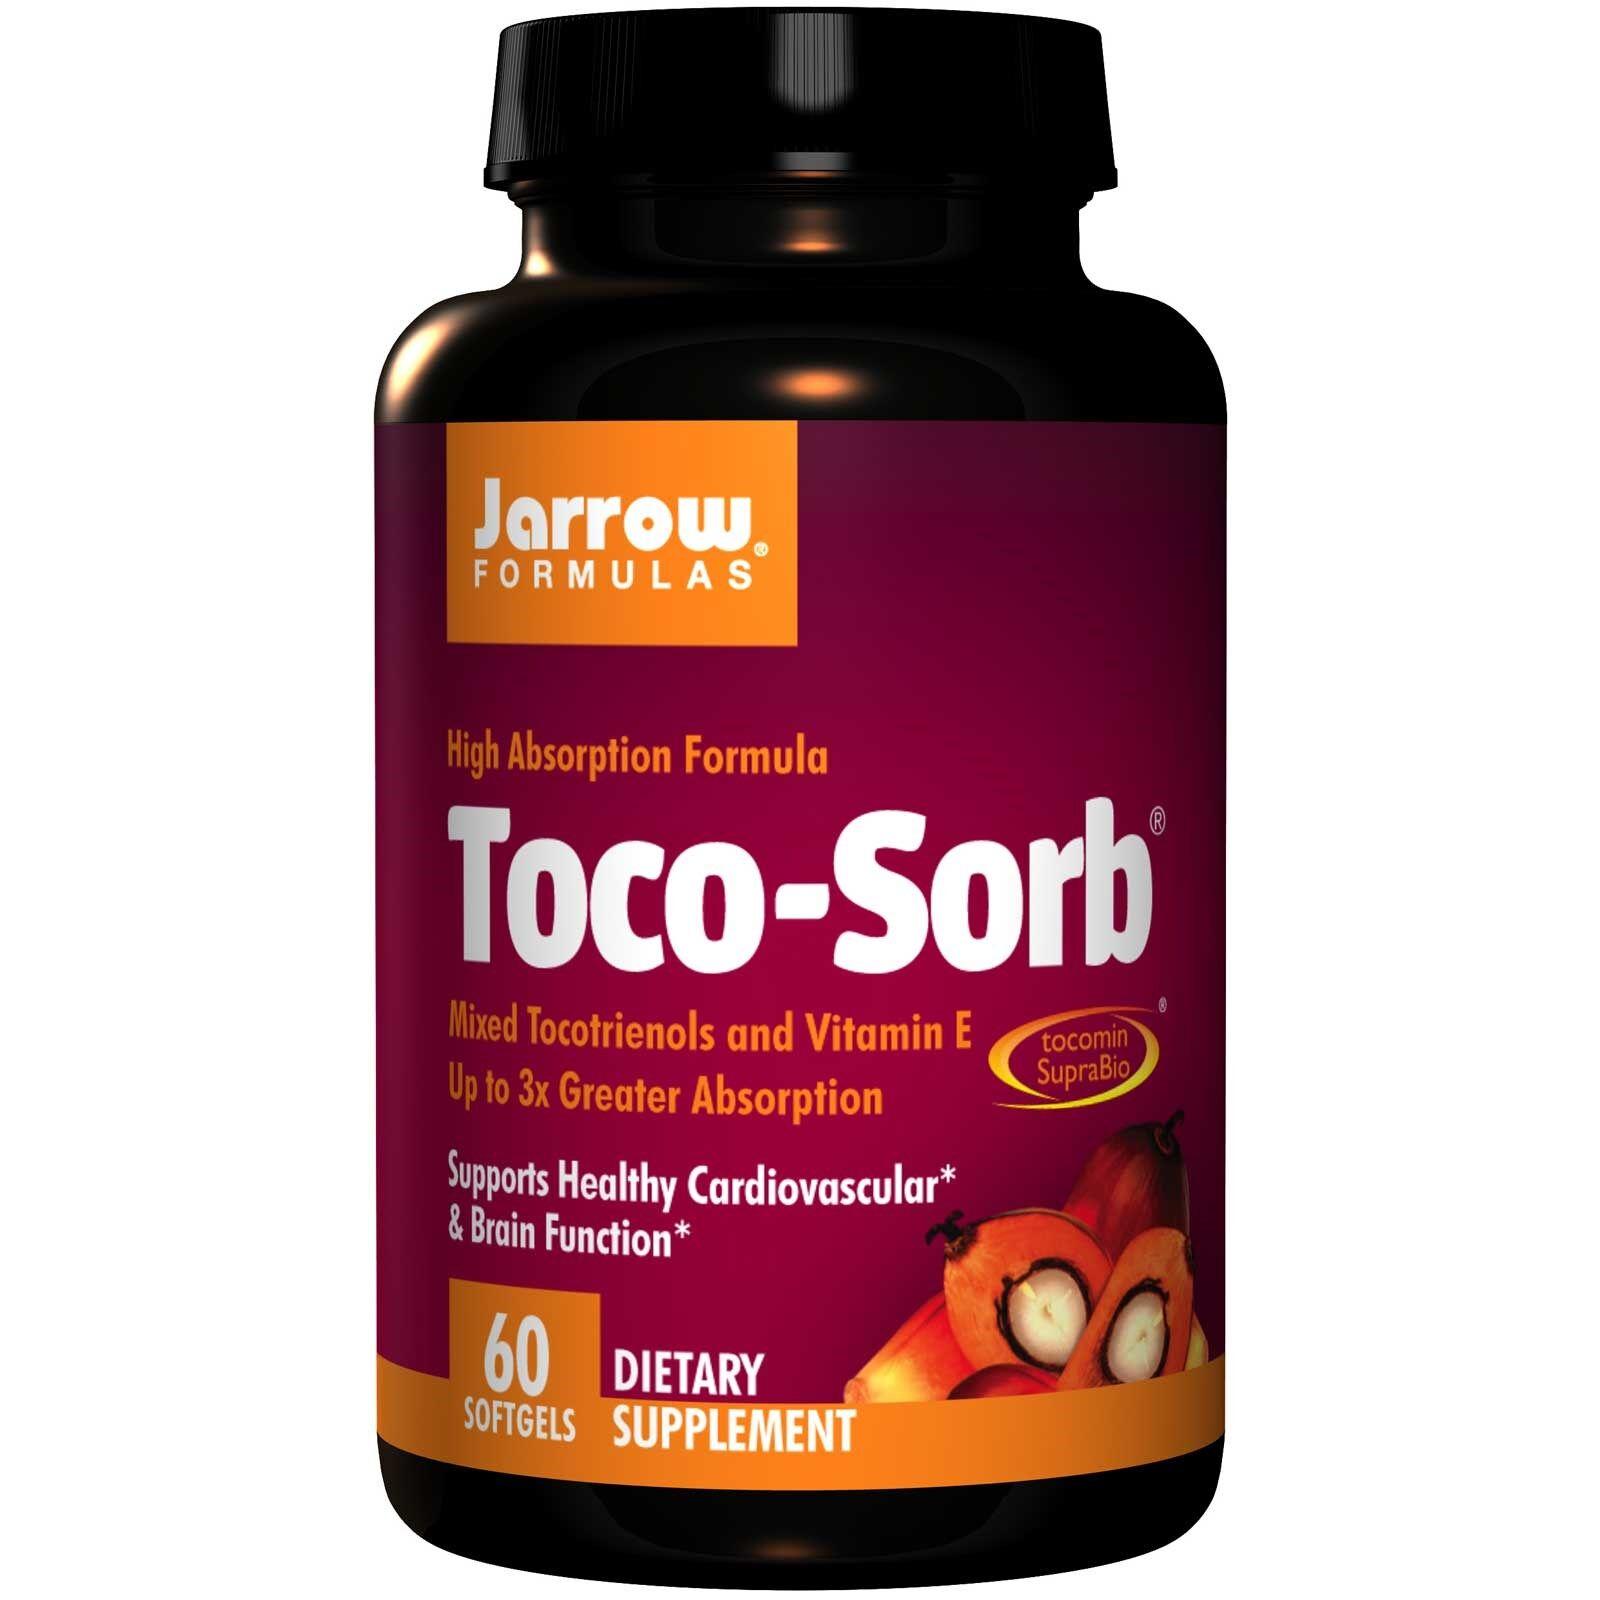 Jarrow Formulas Toco-Sorb mixé tocotriénols et vitamine E (60 gélules) - Jarrow Formulas